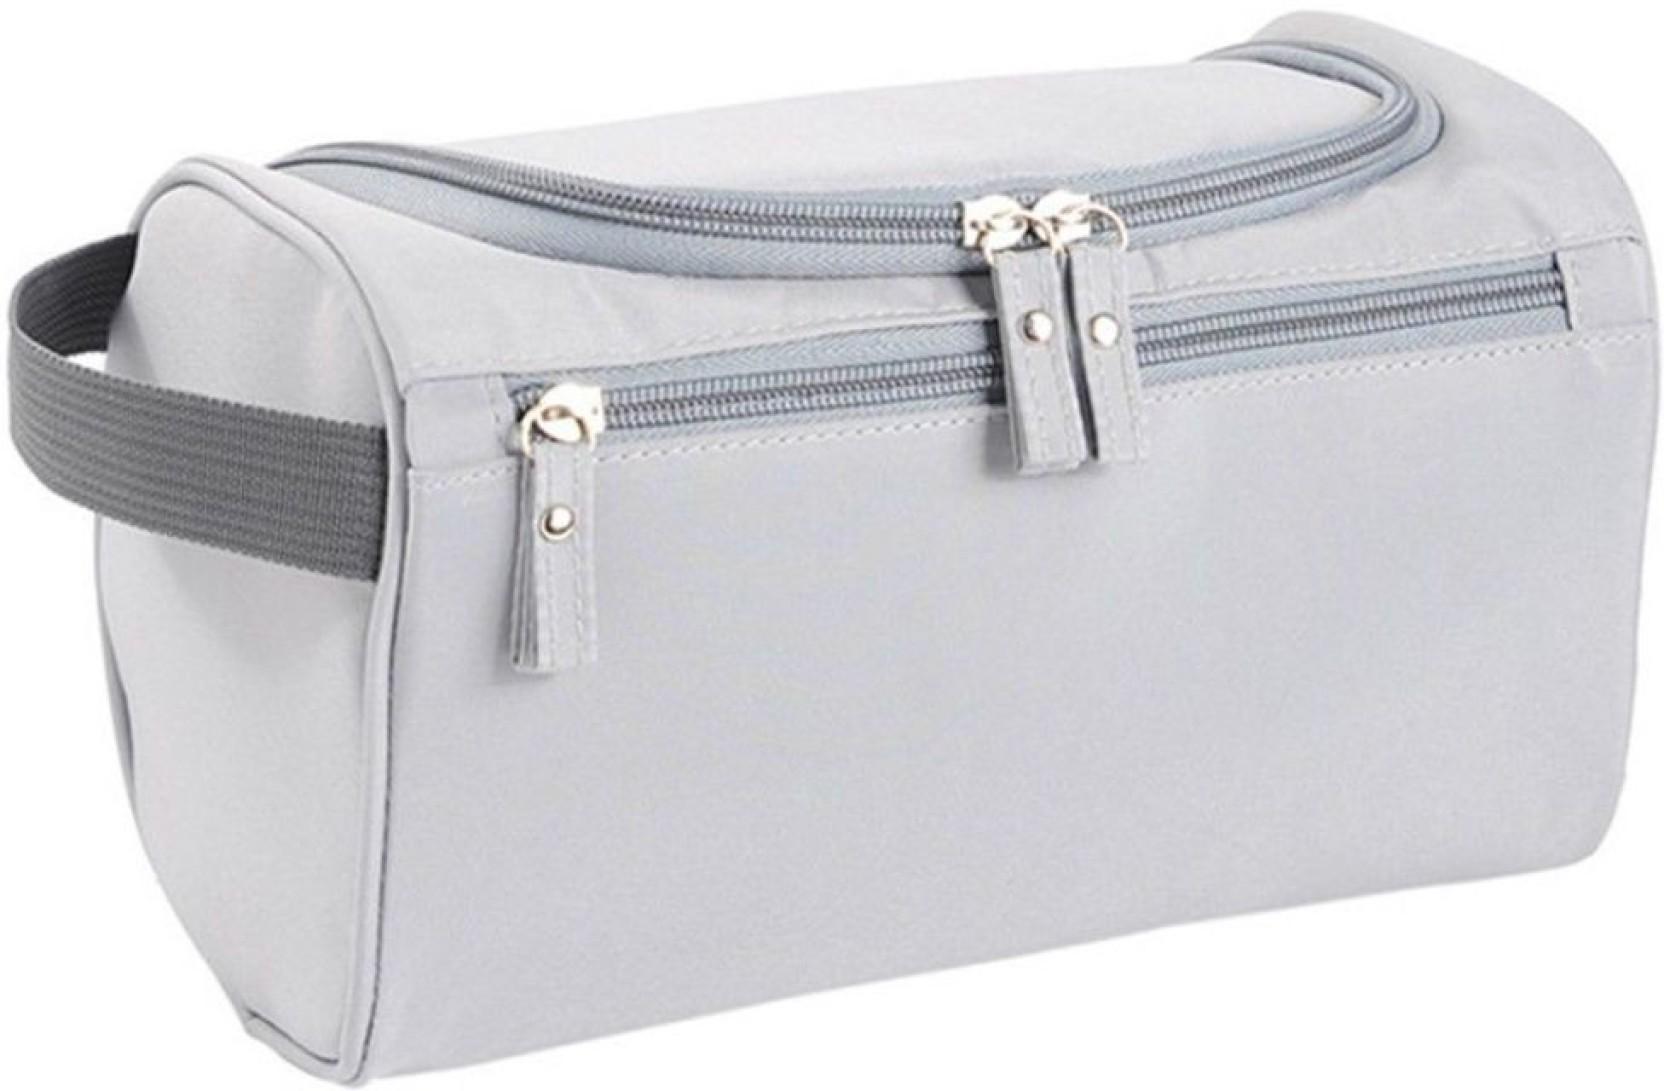 e16a360691 hanging-toiletry-bag-portable-travel-organizer-cosmetic -make-up-original-imaf8hzy3hwfpjsj.jpeg q 90